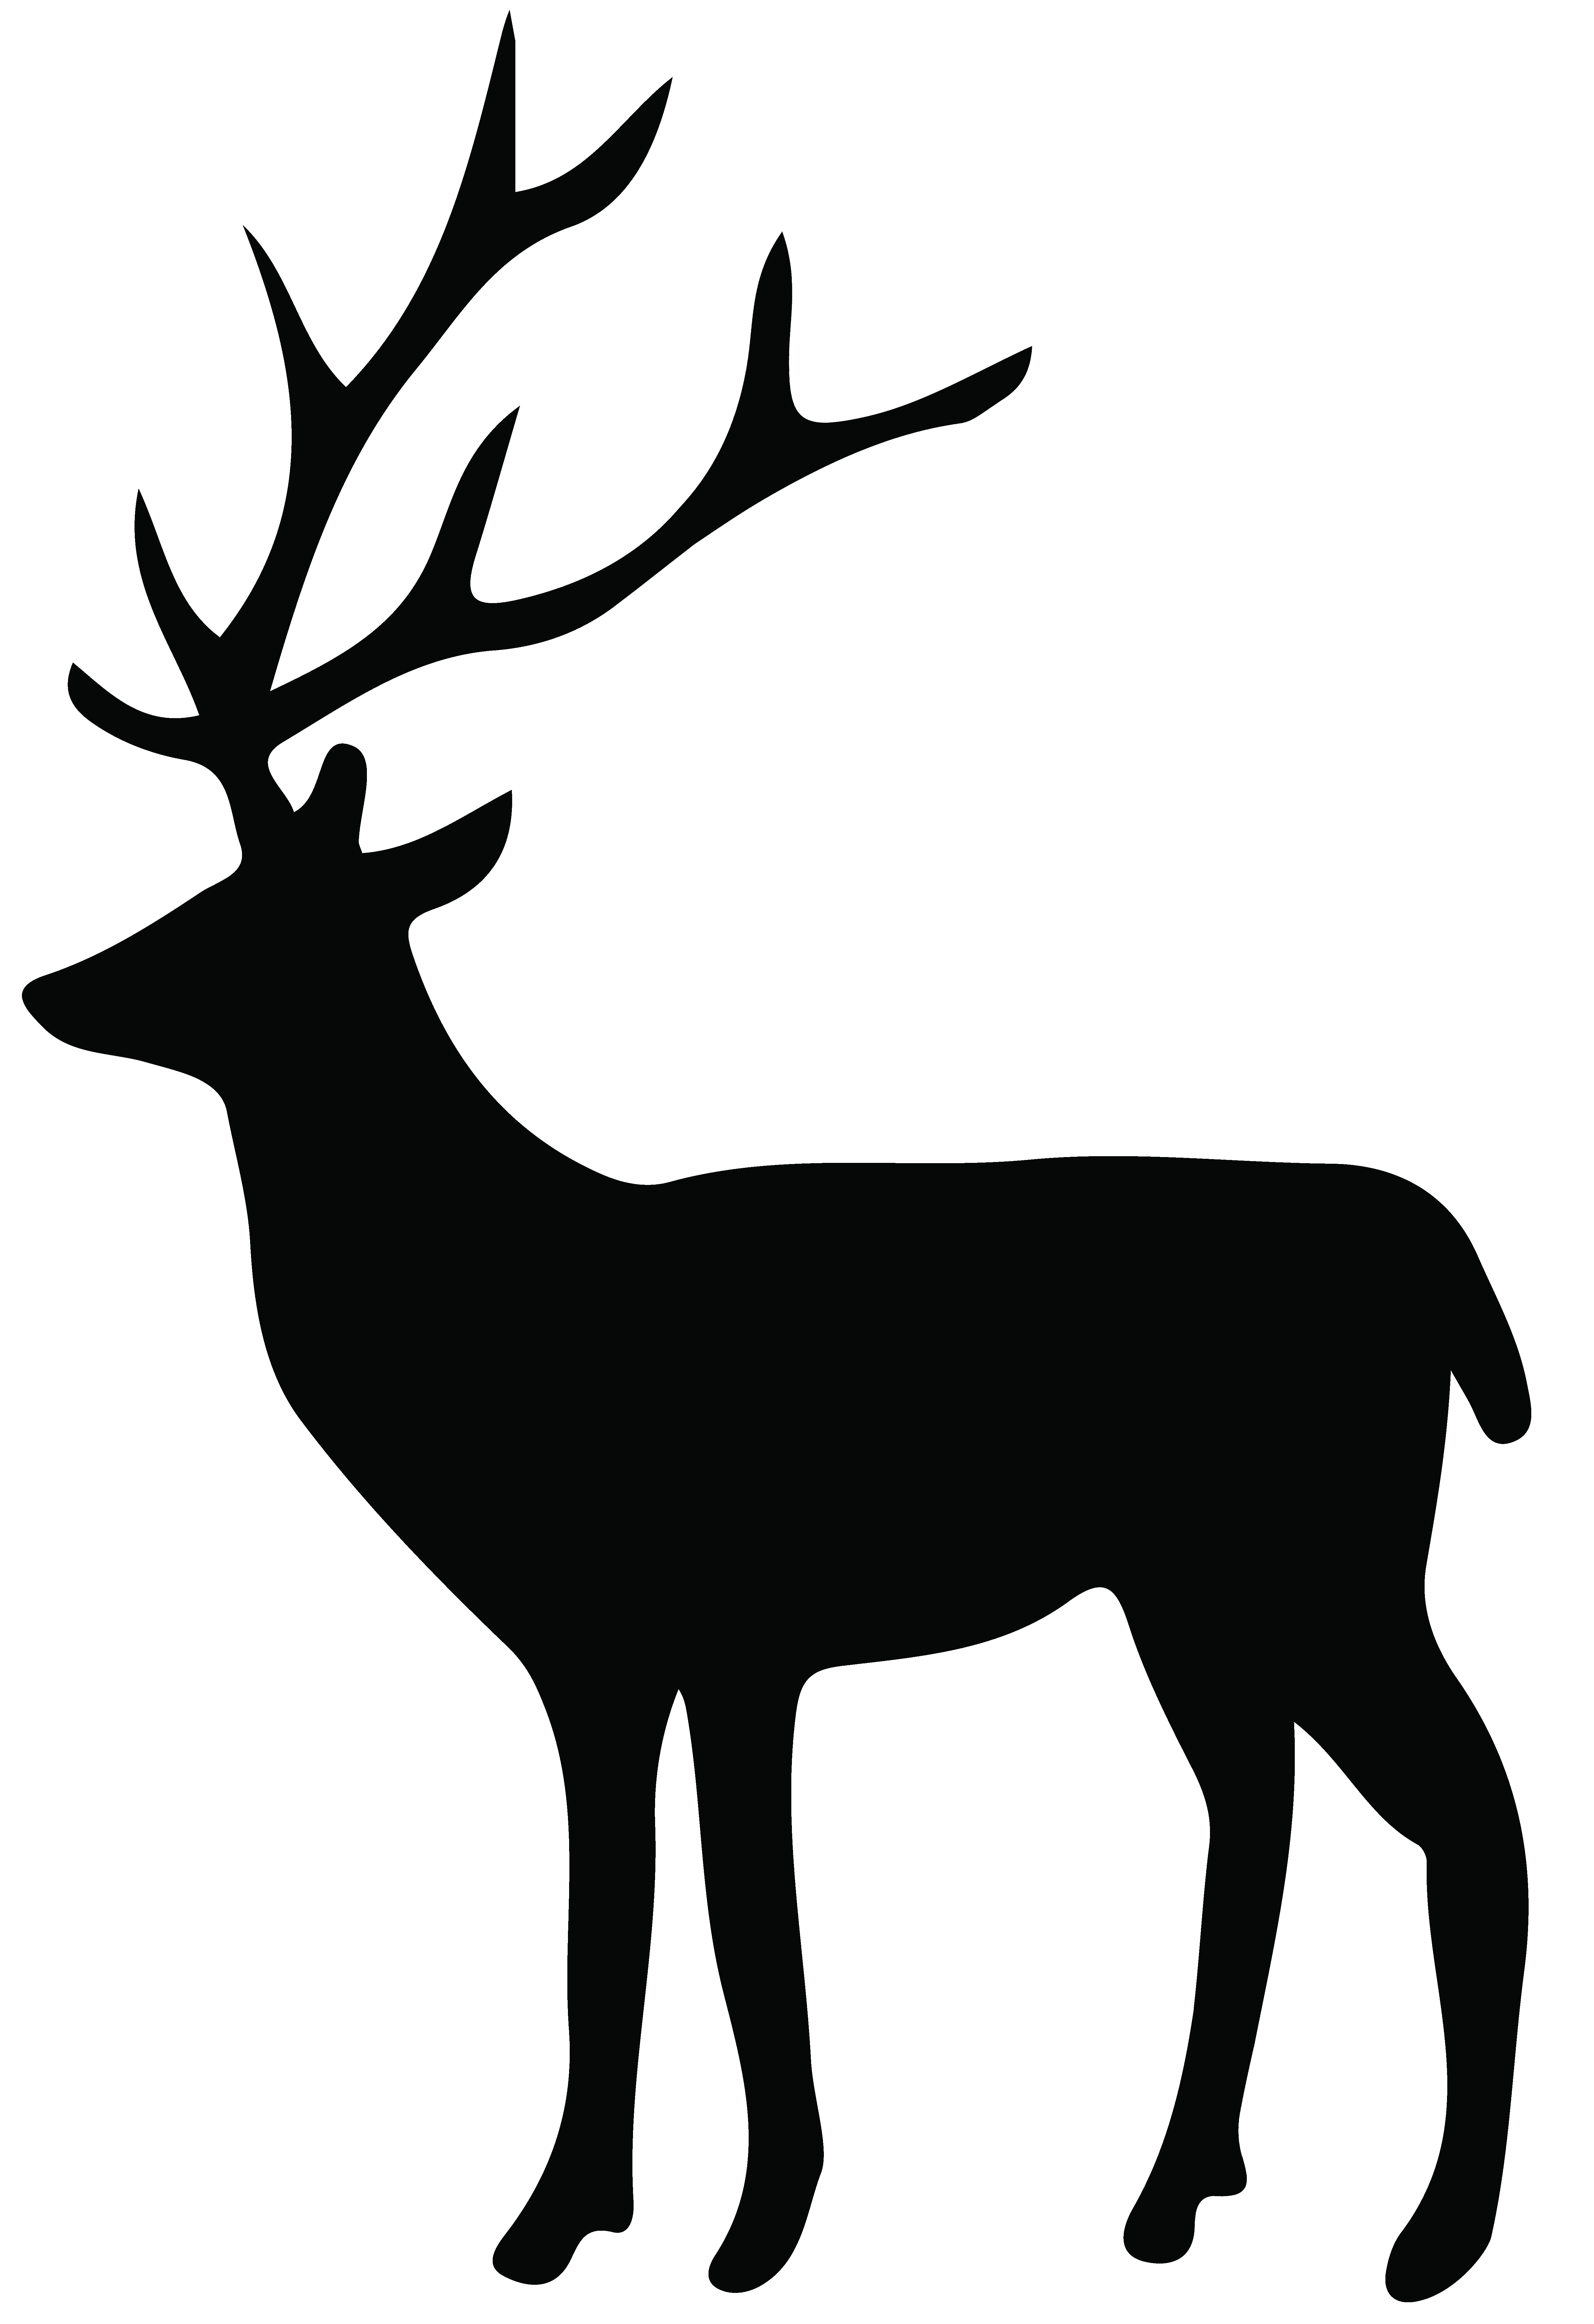 5487x8000 Deer Head Silhouette Png Fiscalreform